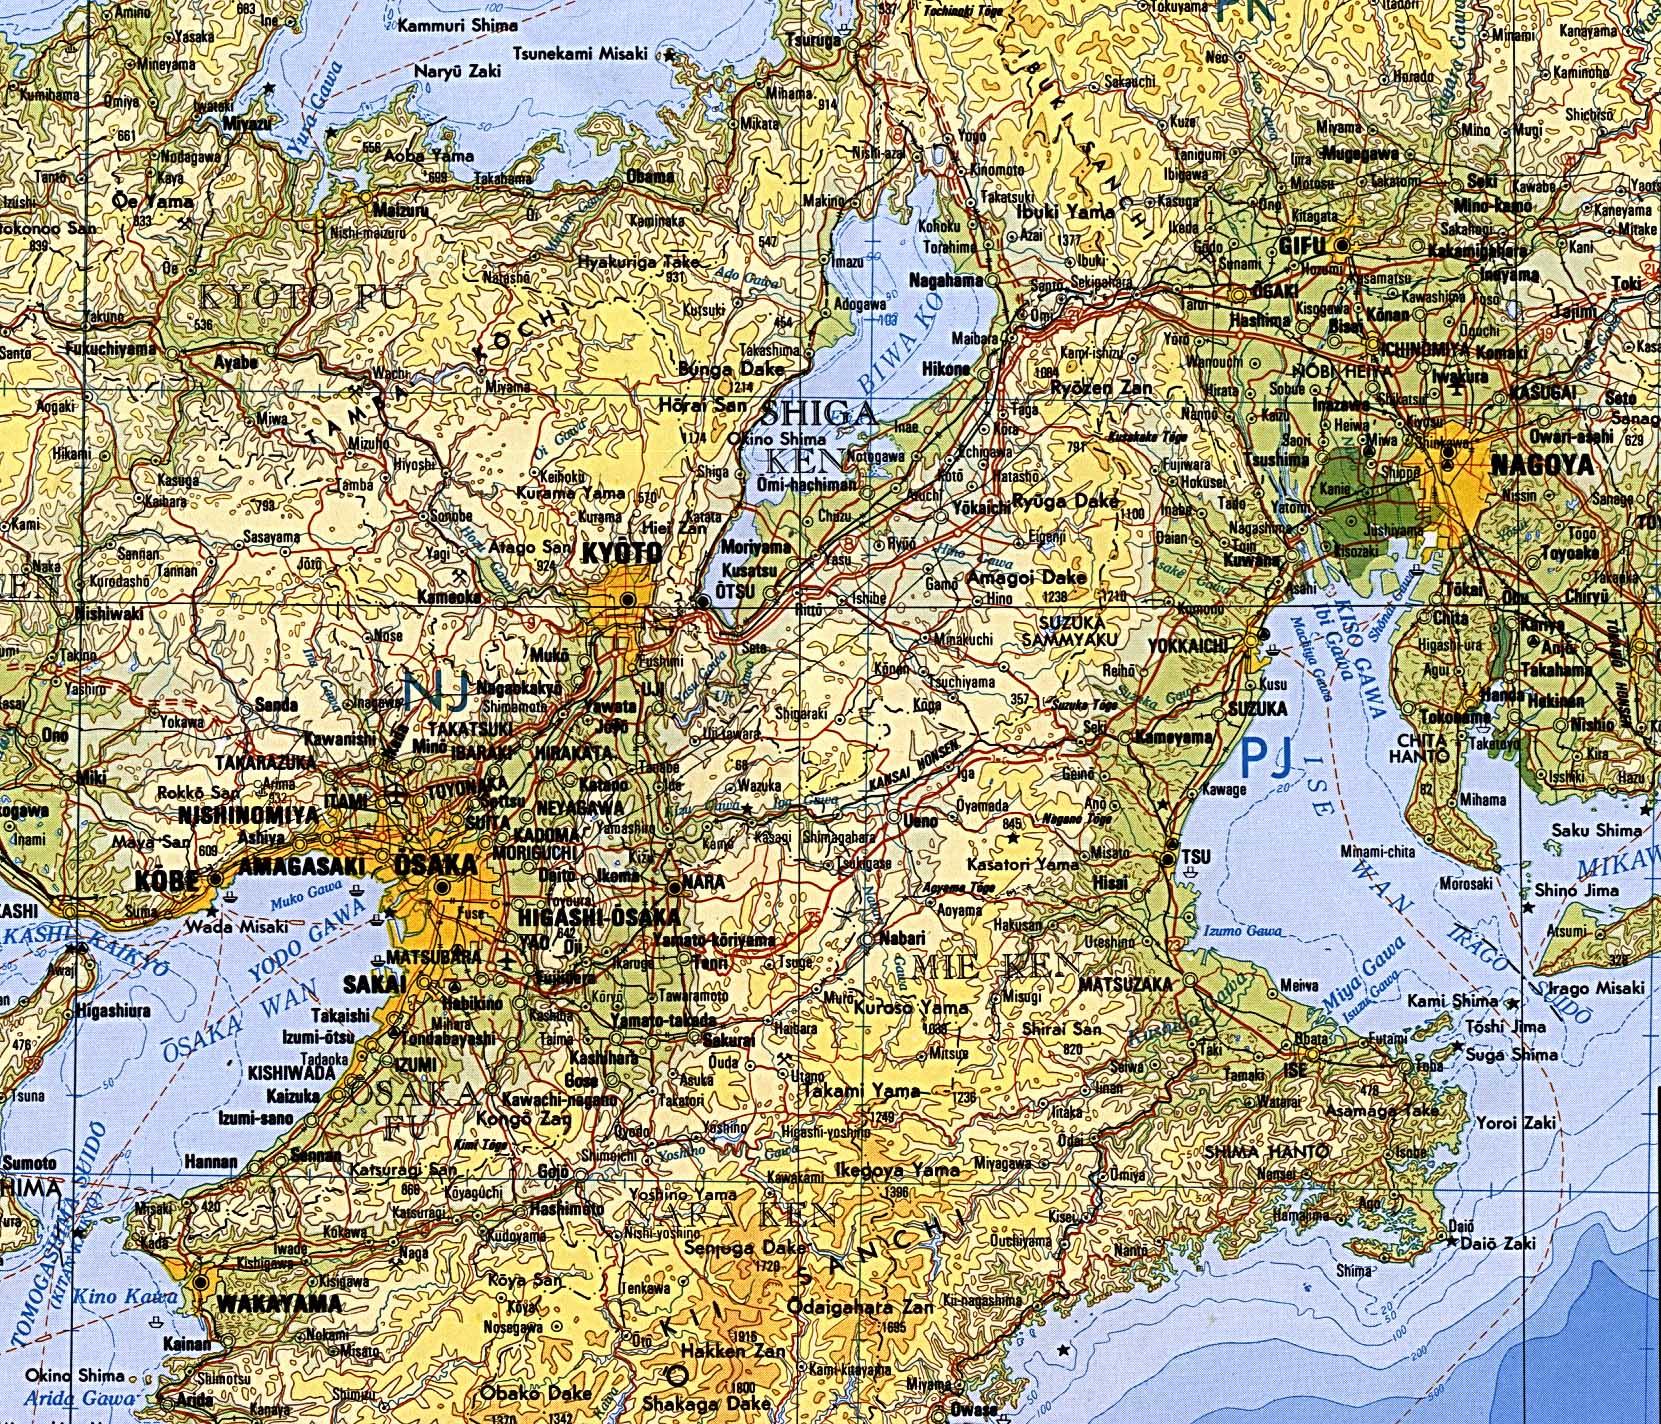 Osaka, Kyoto and Nagoya Region Topographic Map, Japan